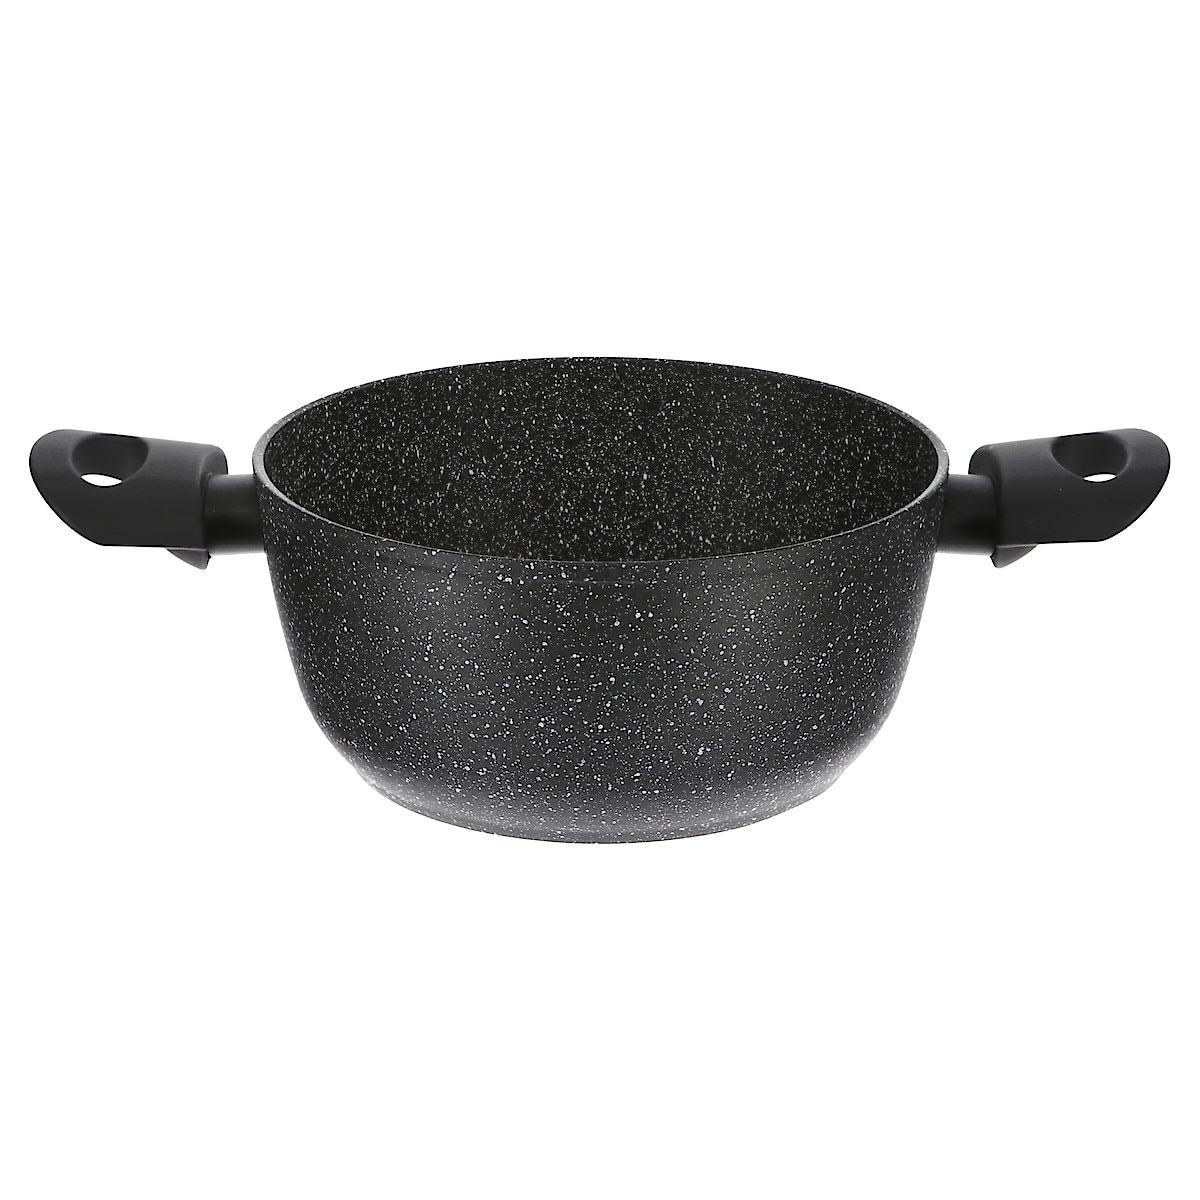 2.5-Litre Casserole Dish